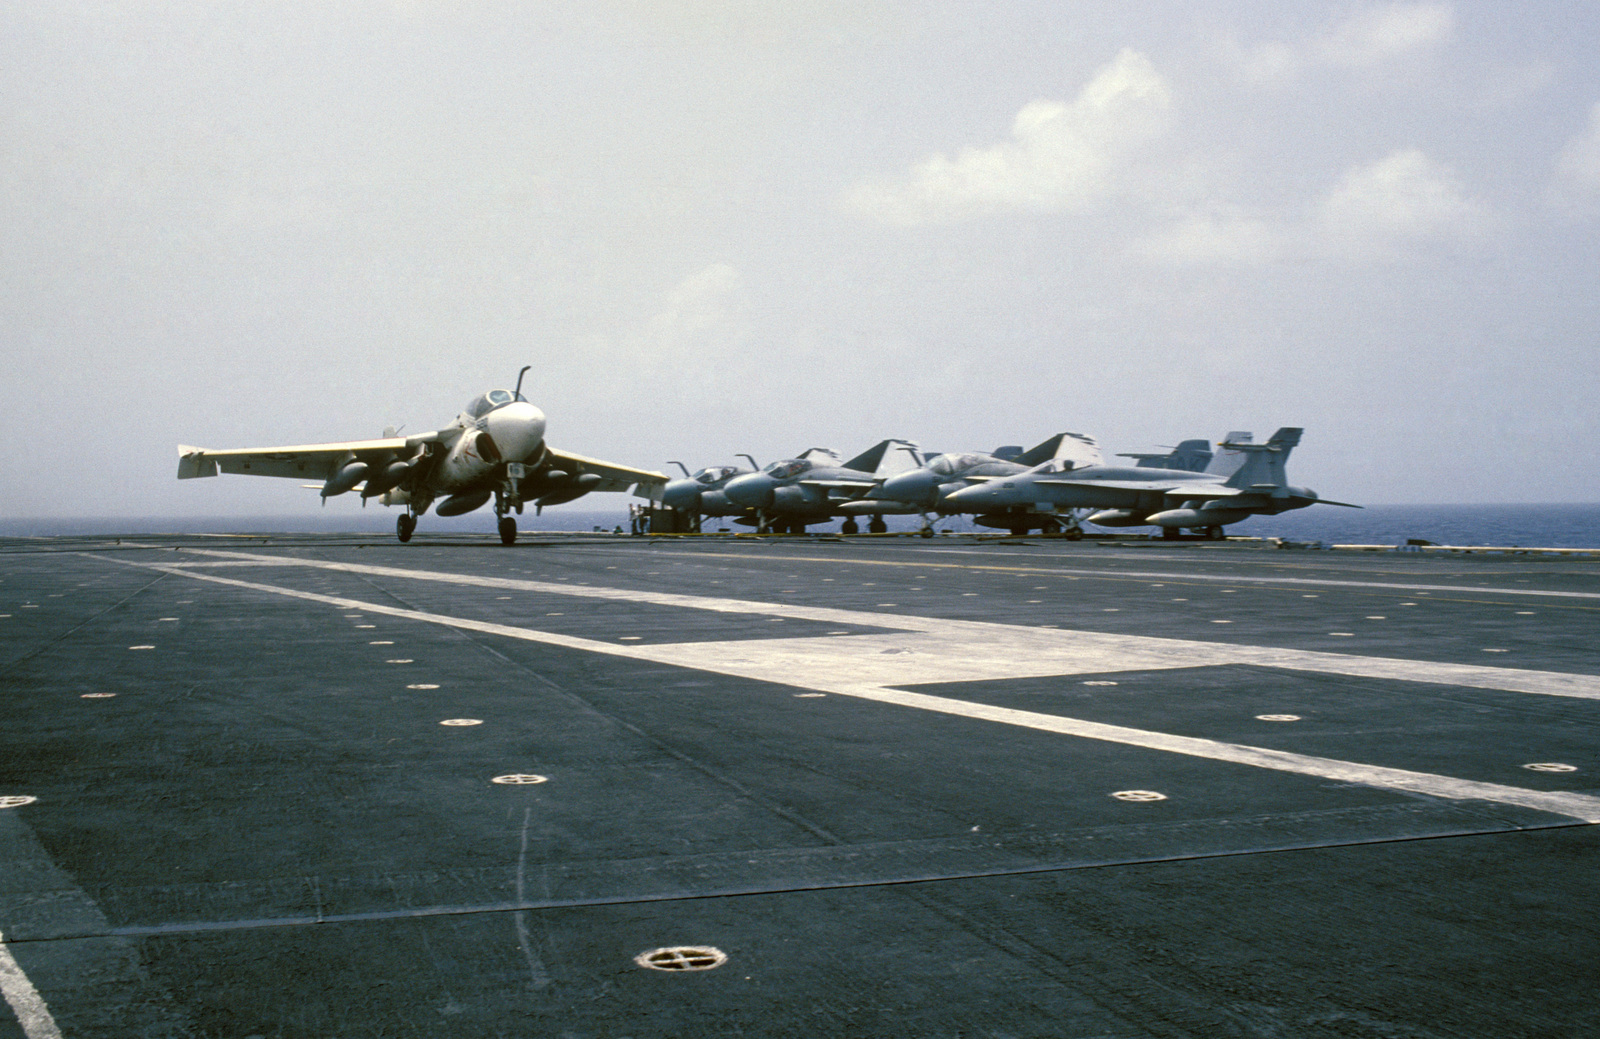 A KA-6D Intruder aircraft lands aboard the aircraft carrier USS CORAL SEA (CV 43). Parked at the deck edge are several A-6E Intruders and an F/A-18A Hornet aircraft